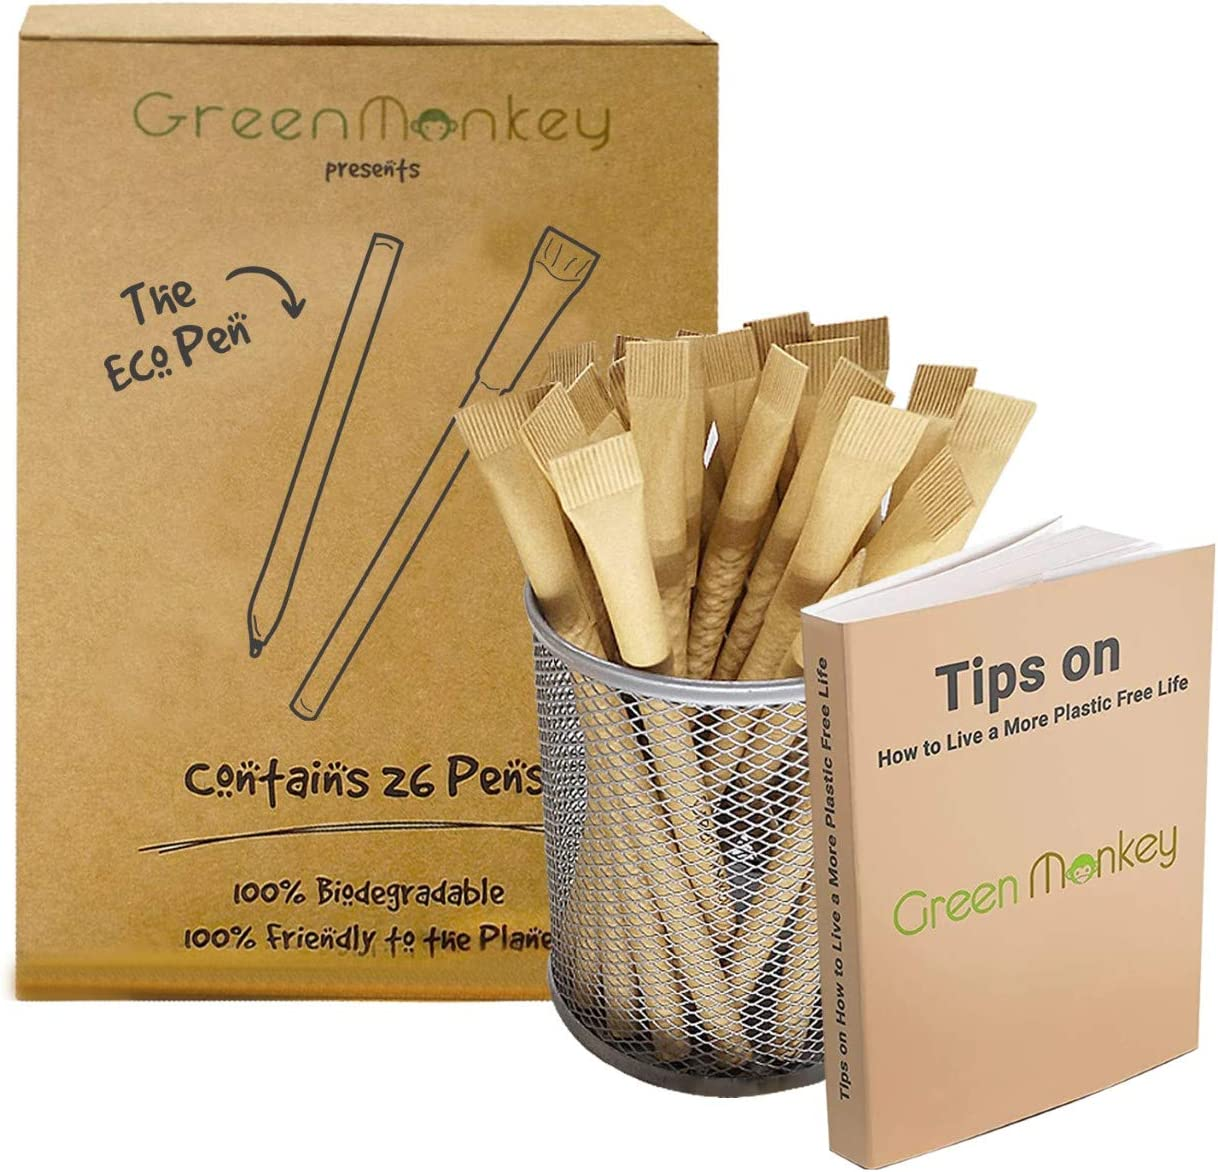 Eco Friendly Max 61% OFF Pens - 26 Max 58% OFF Pack Plastic Biodegradable Zero F Waste